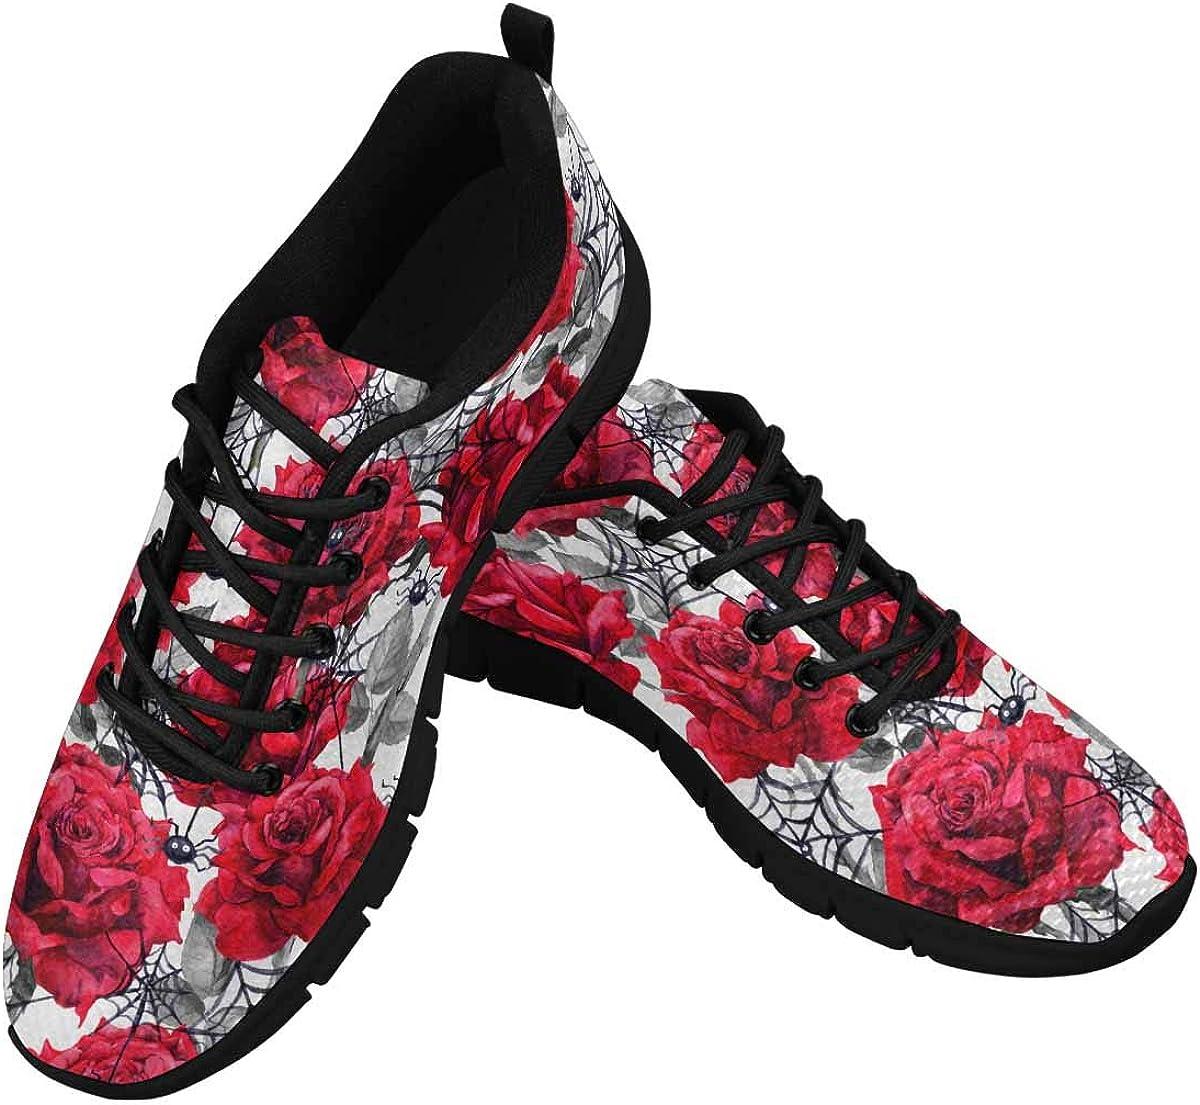 INTERESTPRINT Red Peonies Women's Athletic Mesh Breathable Casual Sneakers